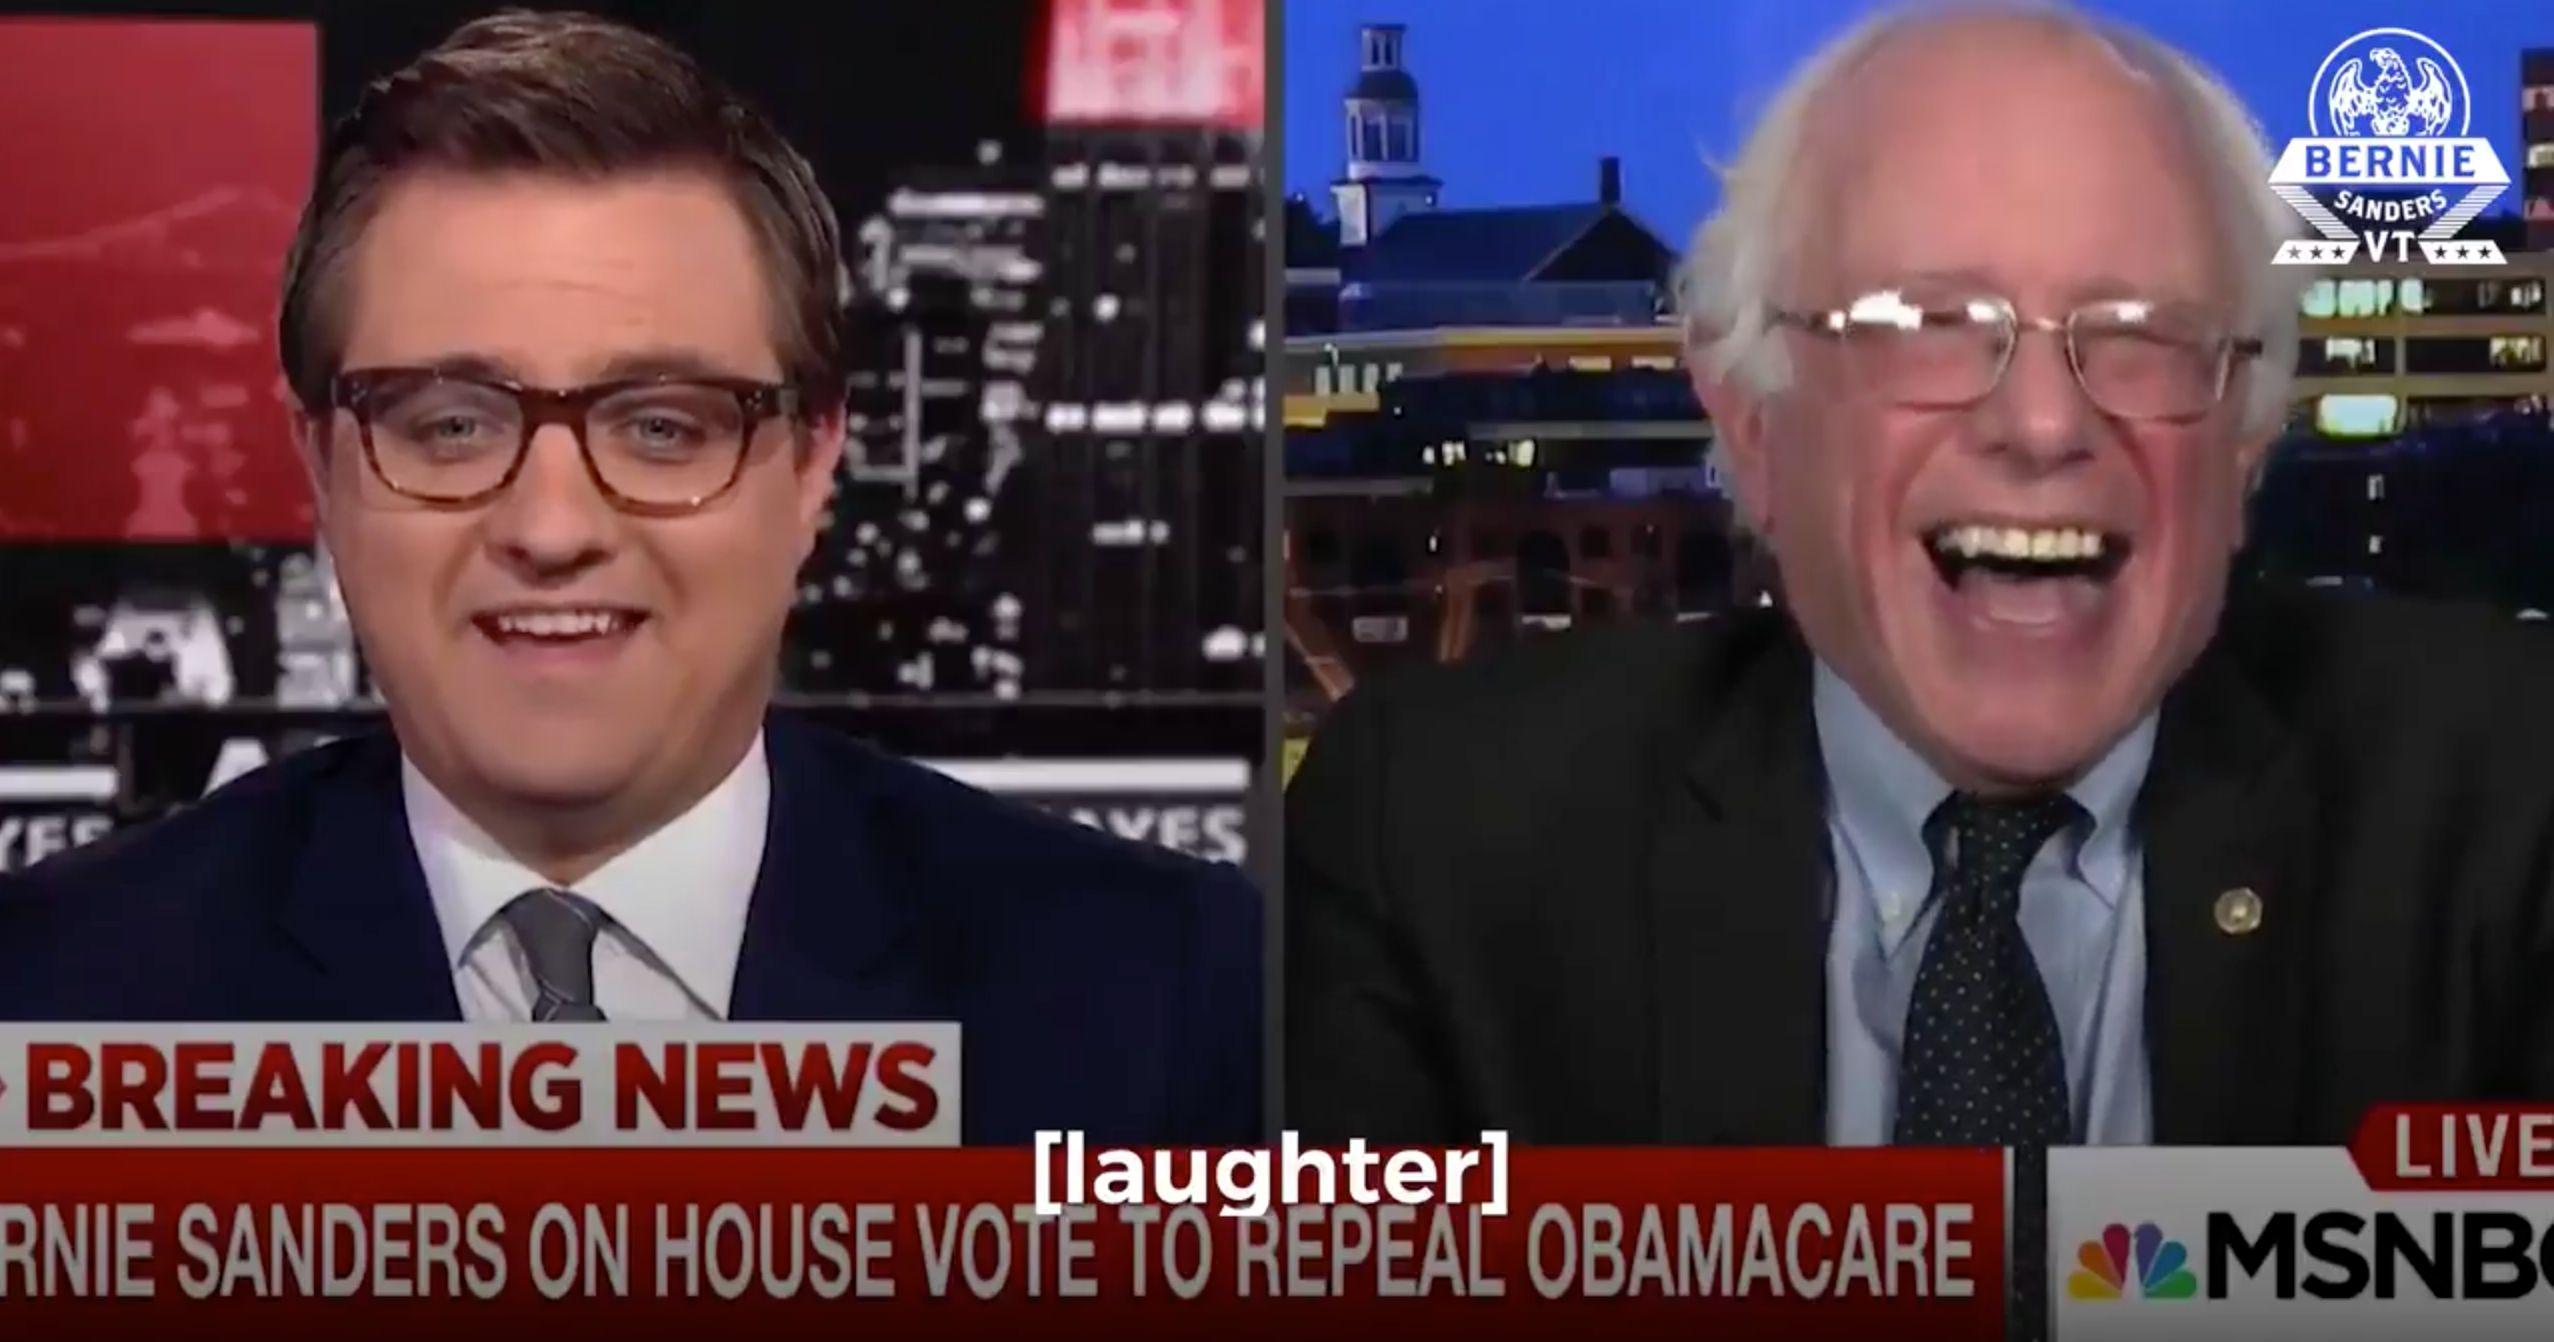 Bernie Sanders Mocks Donald Trump For Making Awkward Health Care